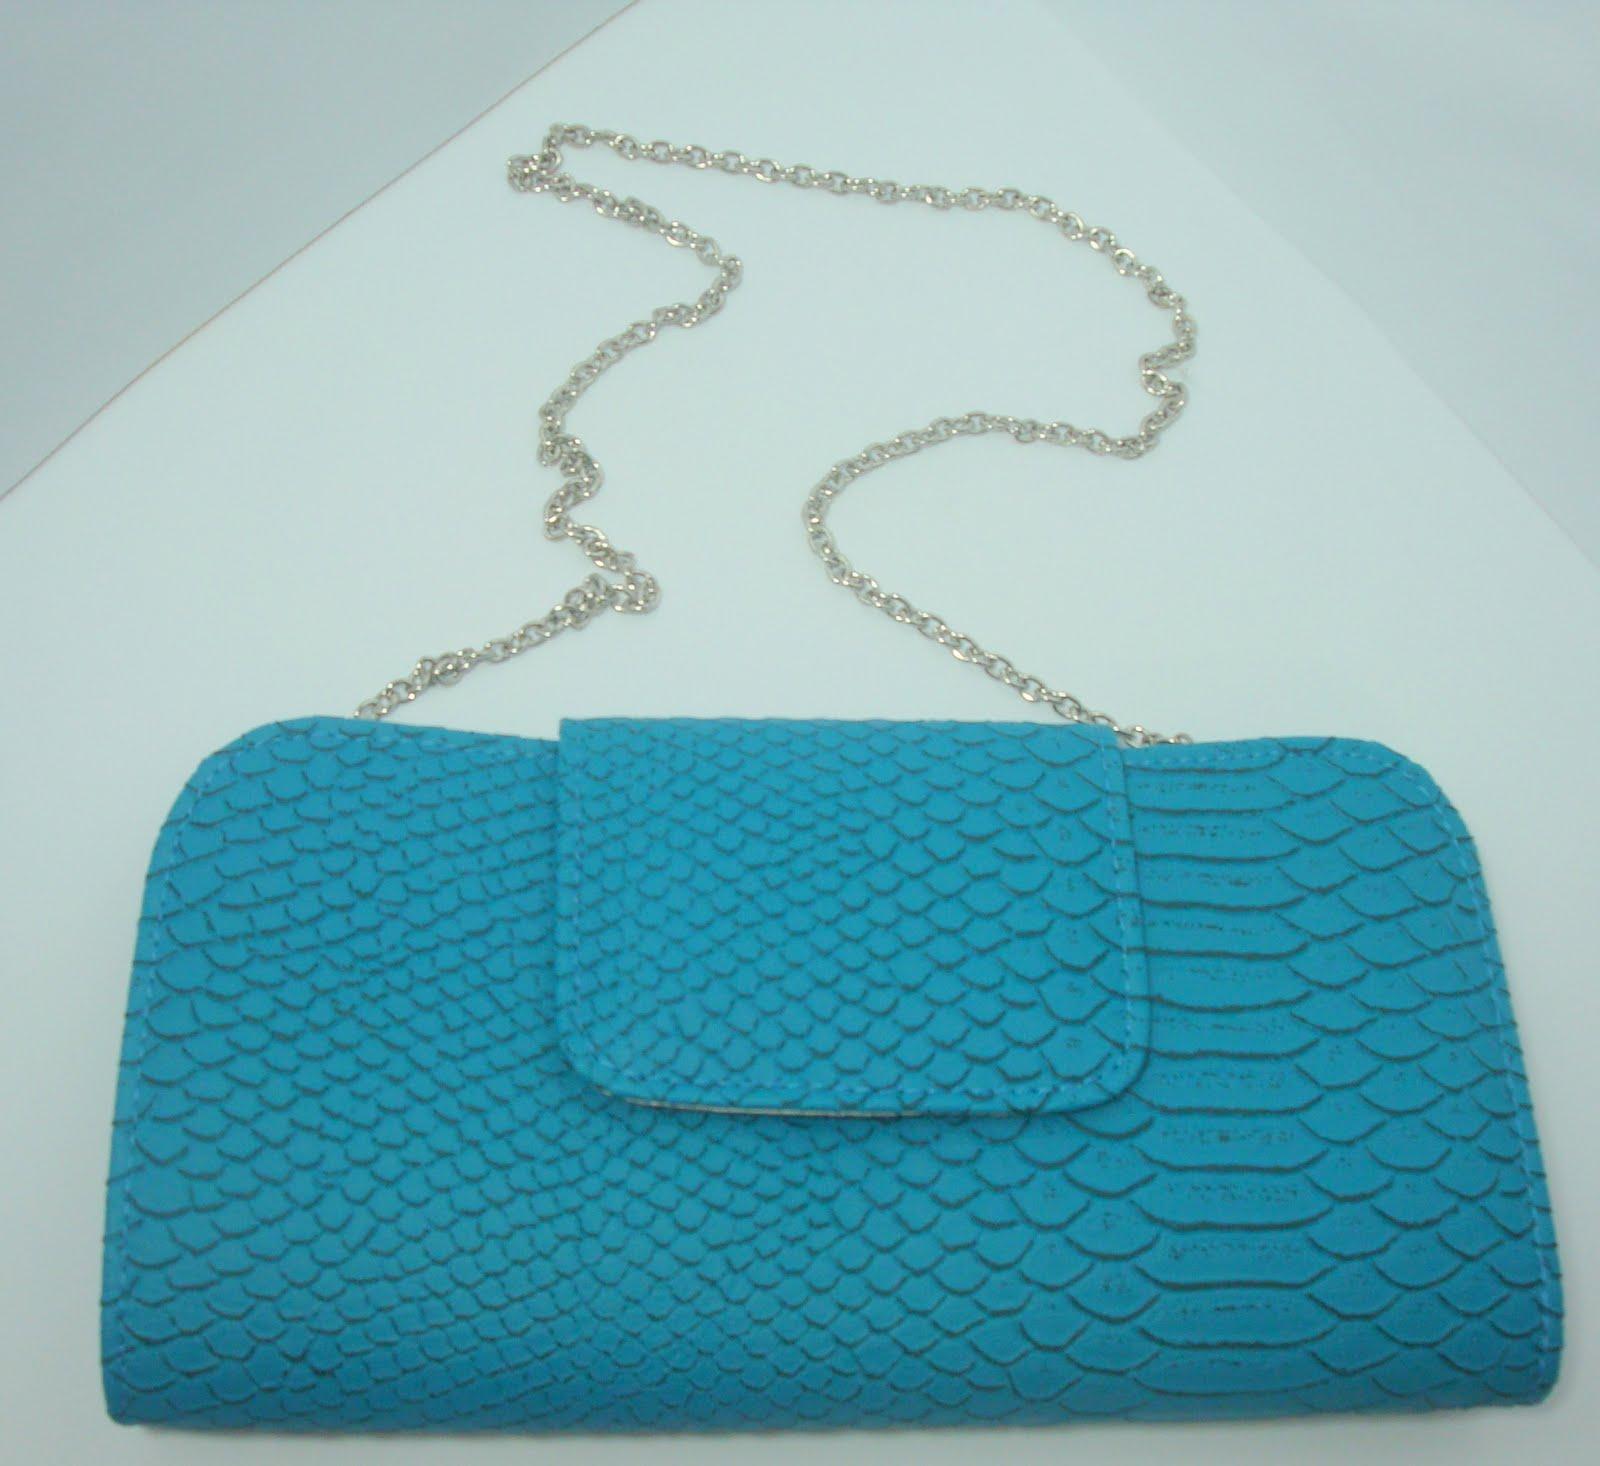 Bolsa Feminina Azul Turquesa : Trouxe na bagagem bolsa carteira pequena azul turquesa